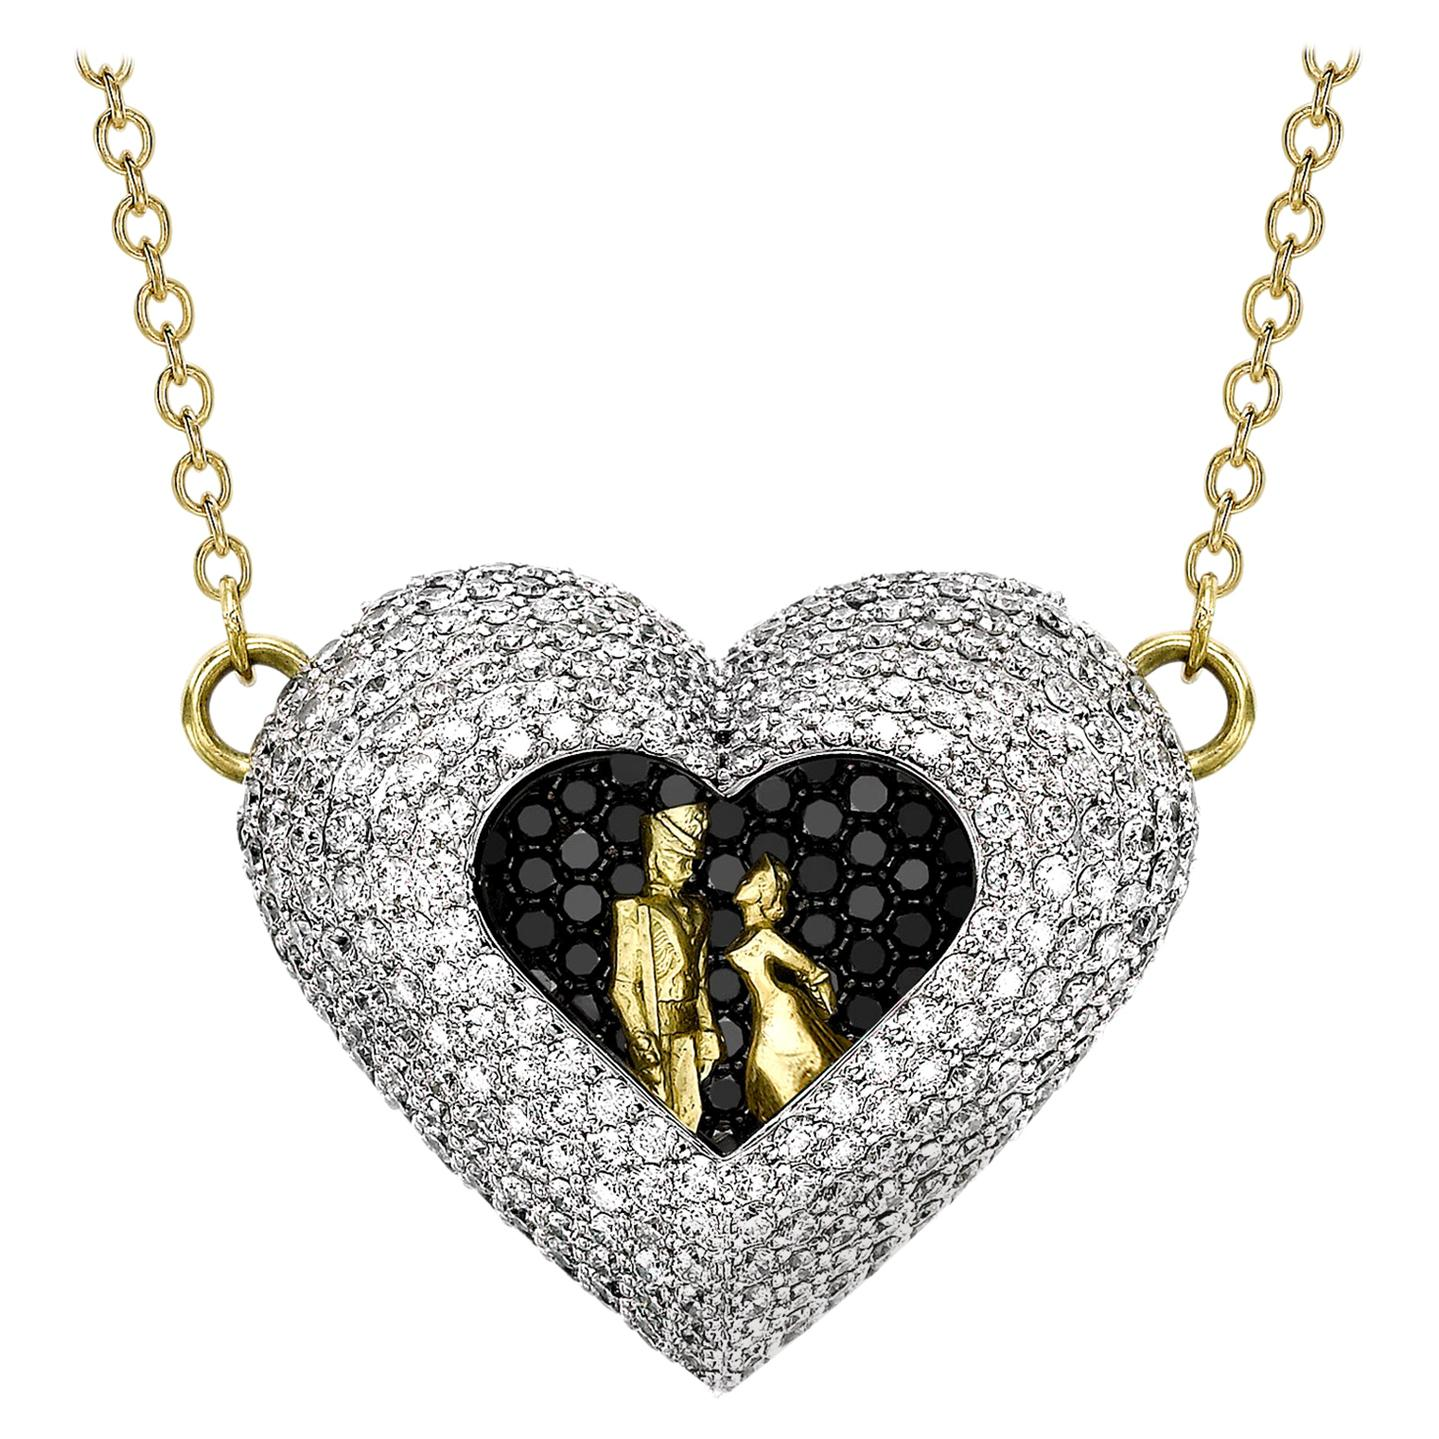 Sybarite Jewellery Heart 4.23 Carat Diamond Fashion Pendant Necklace